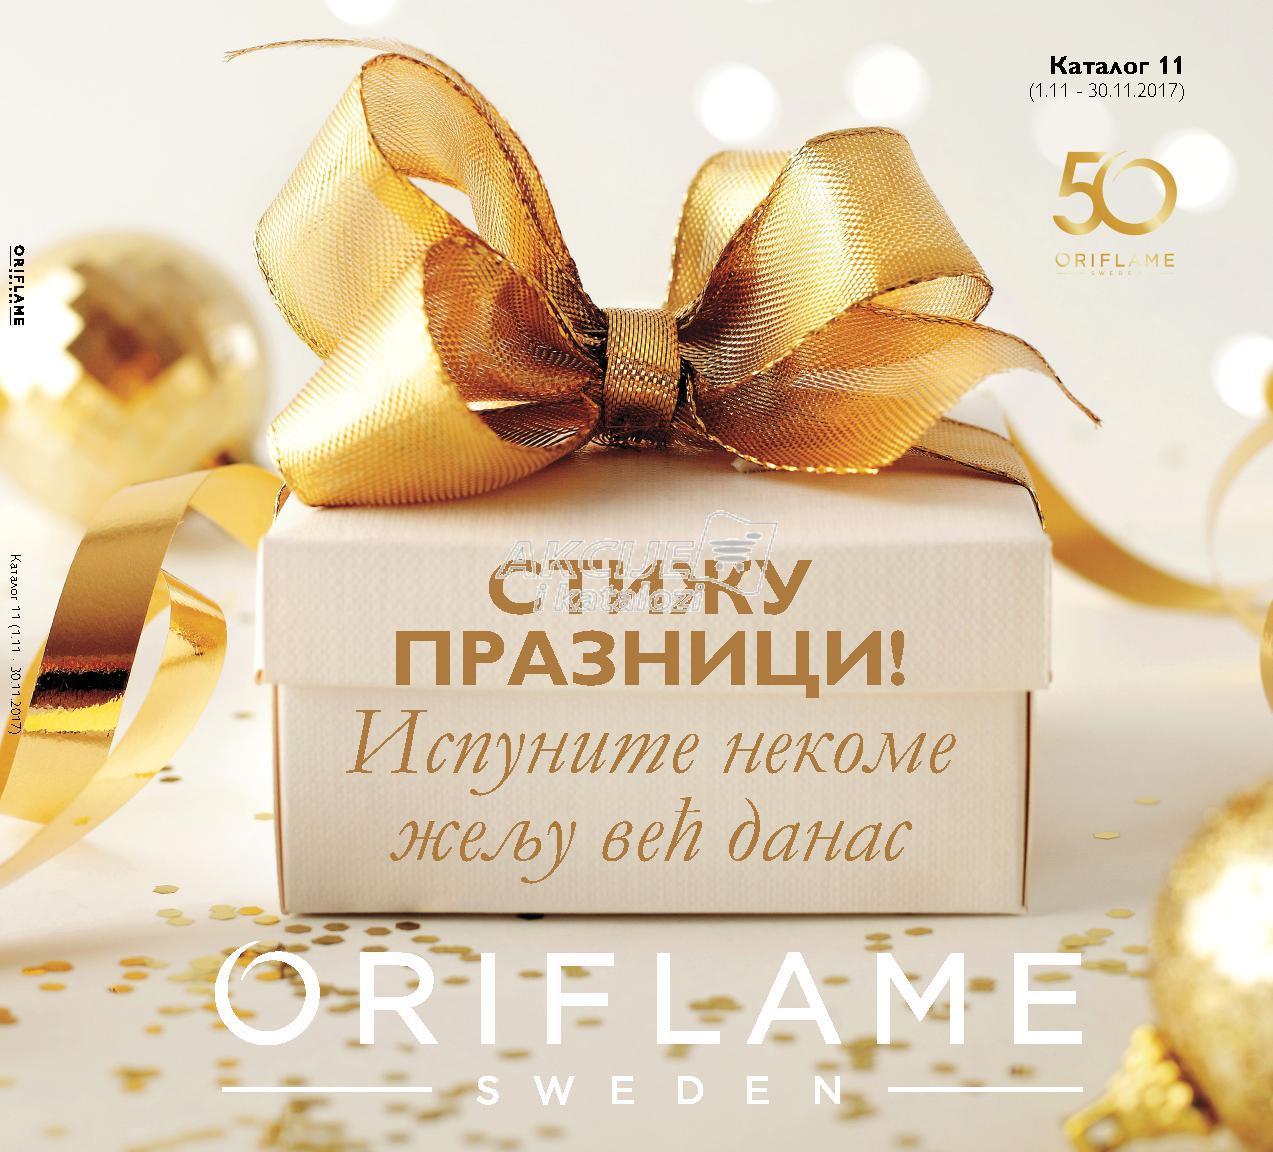 Oriflame - Redovna akcija super cena